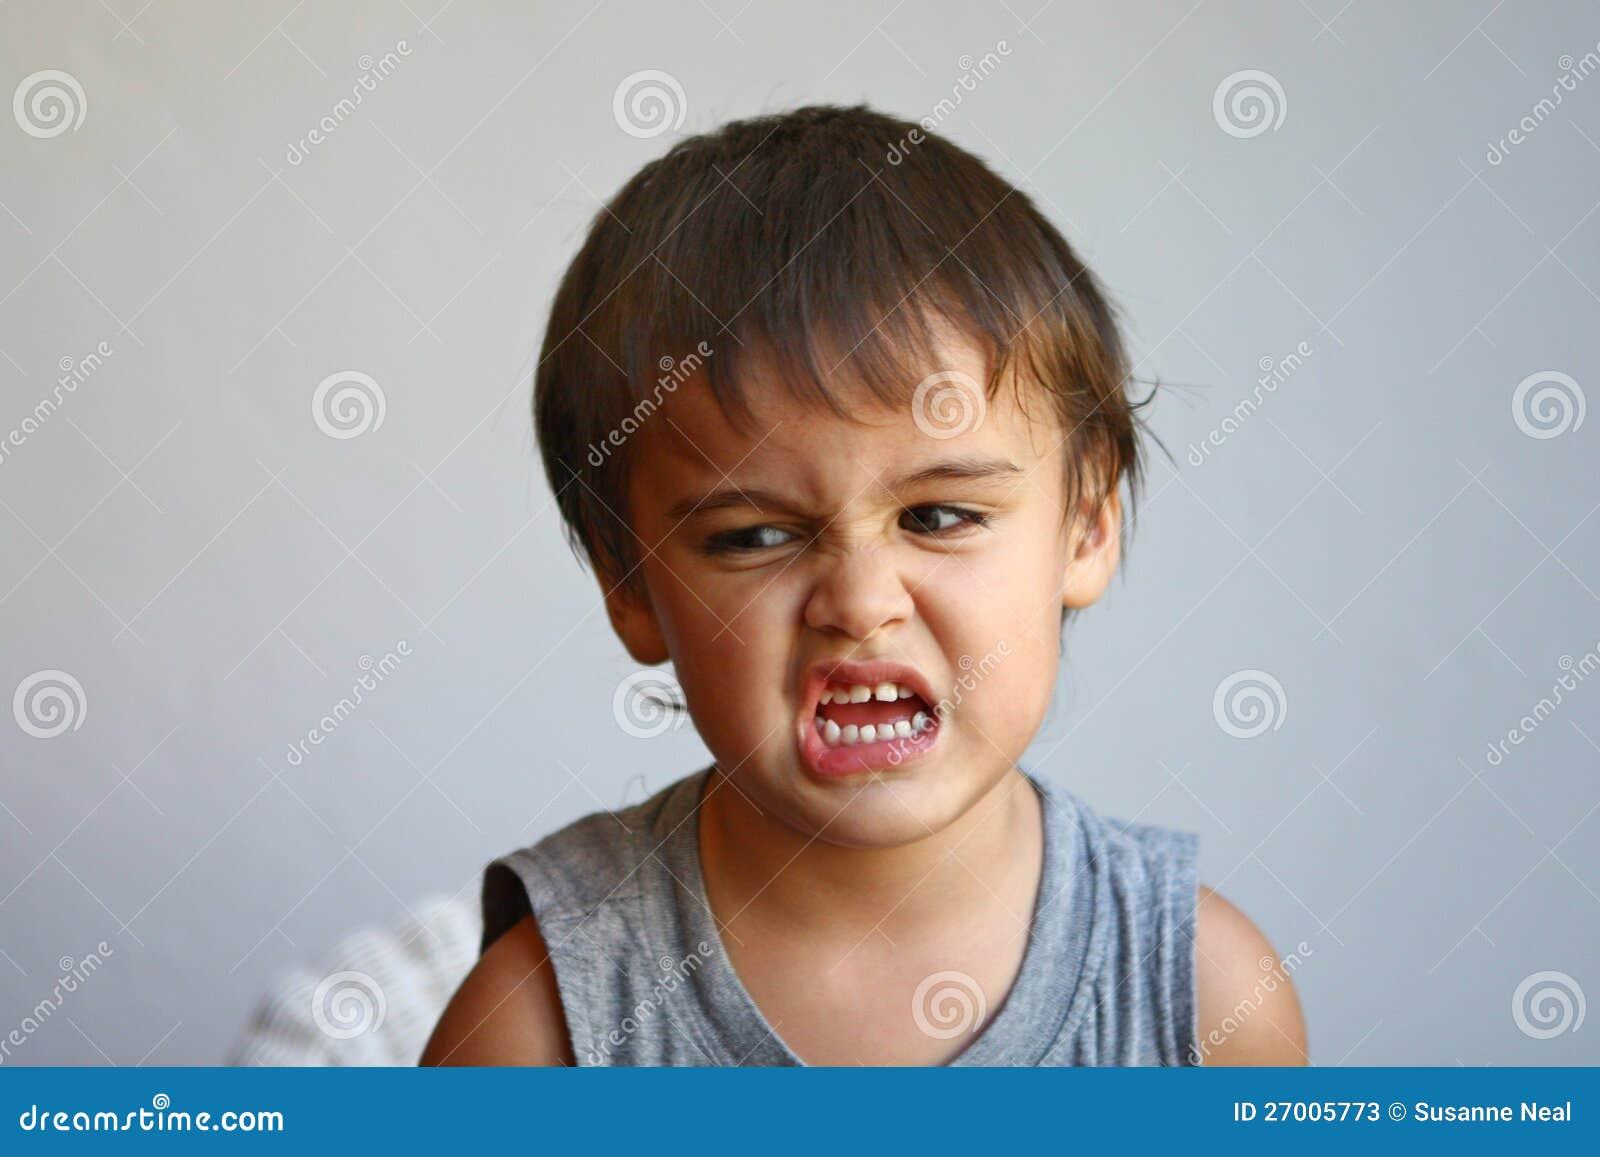 cute little boy makes face showing eww stock photos